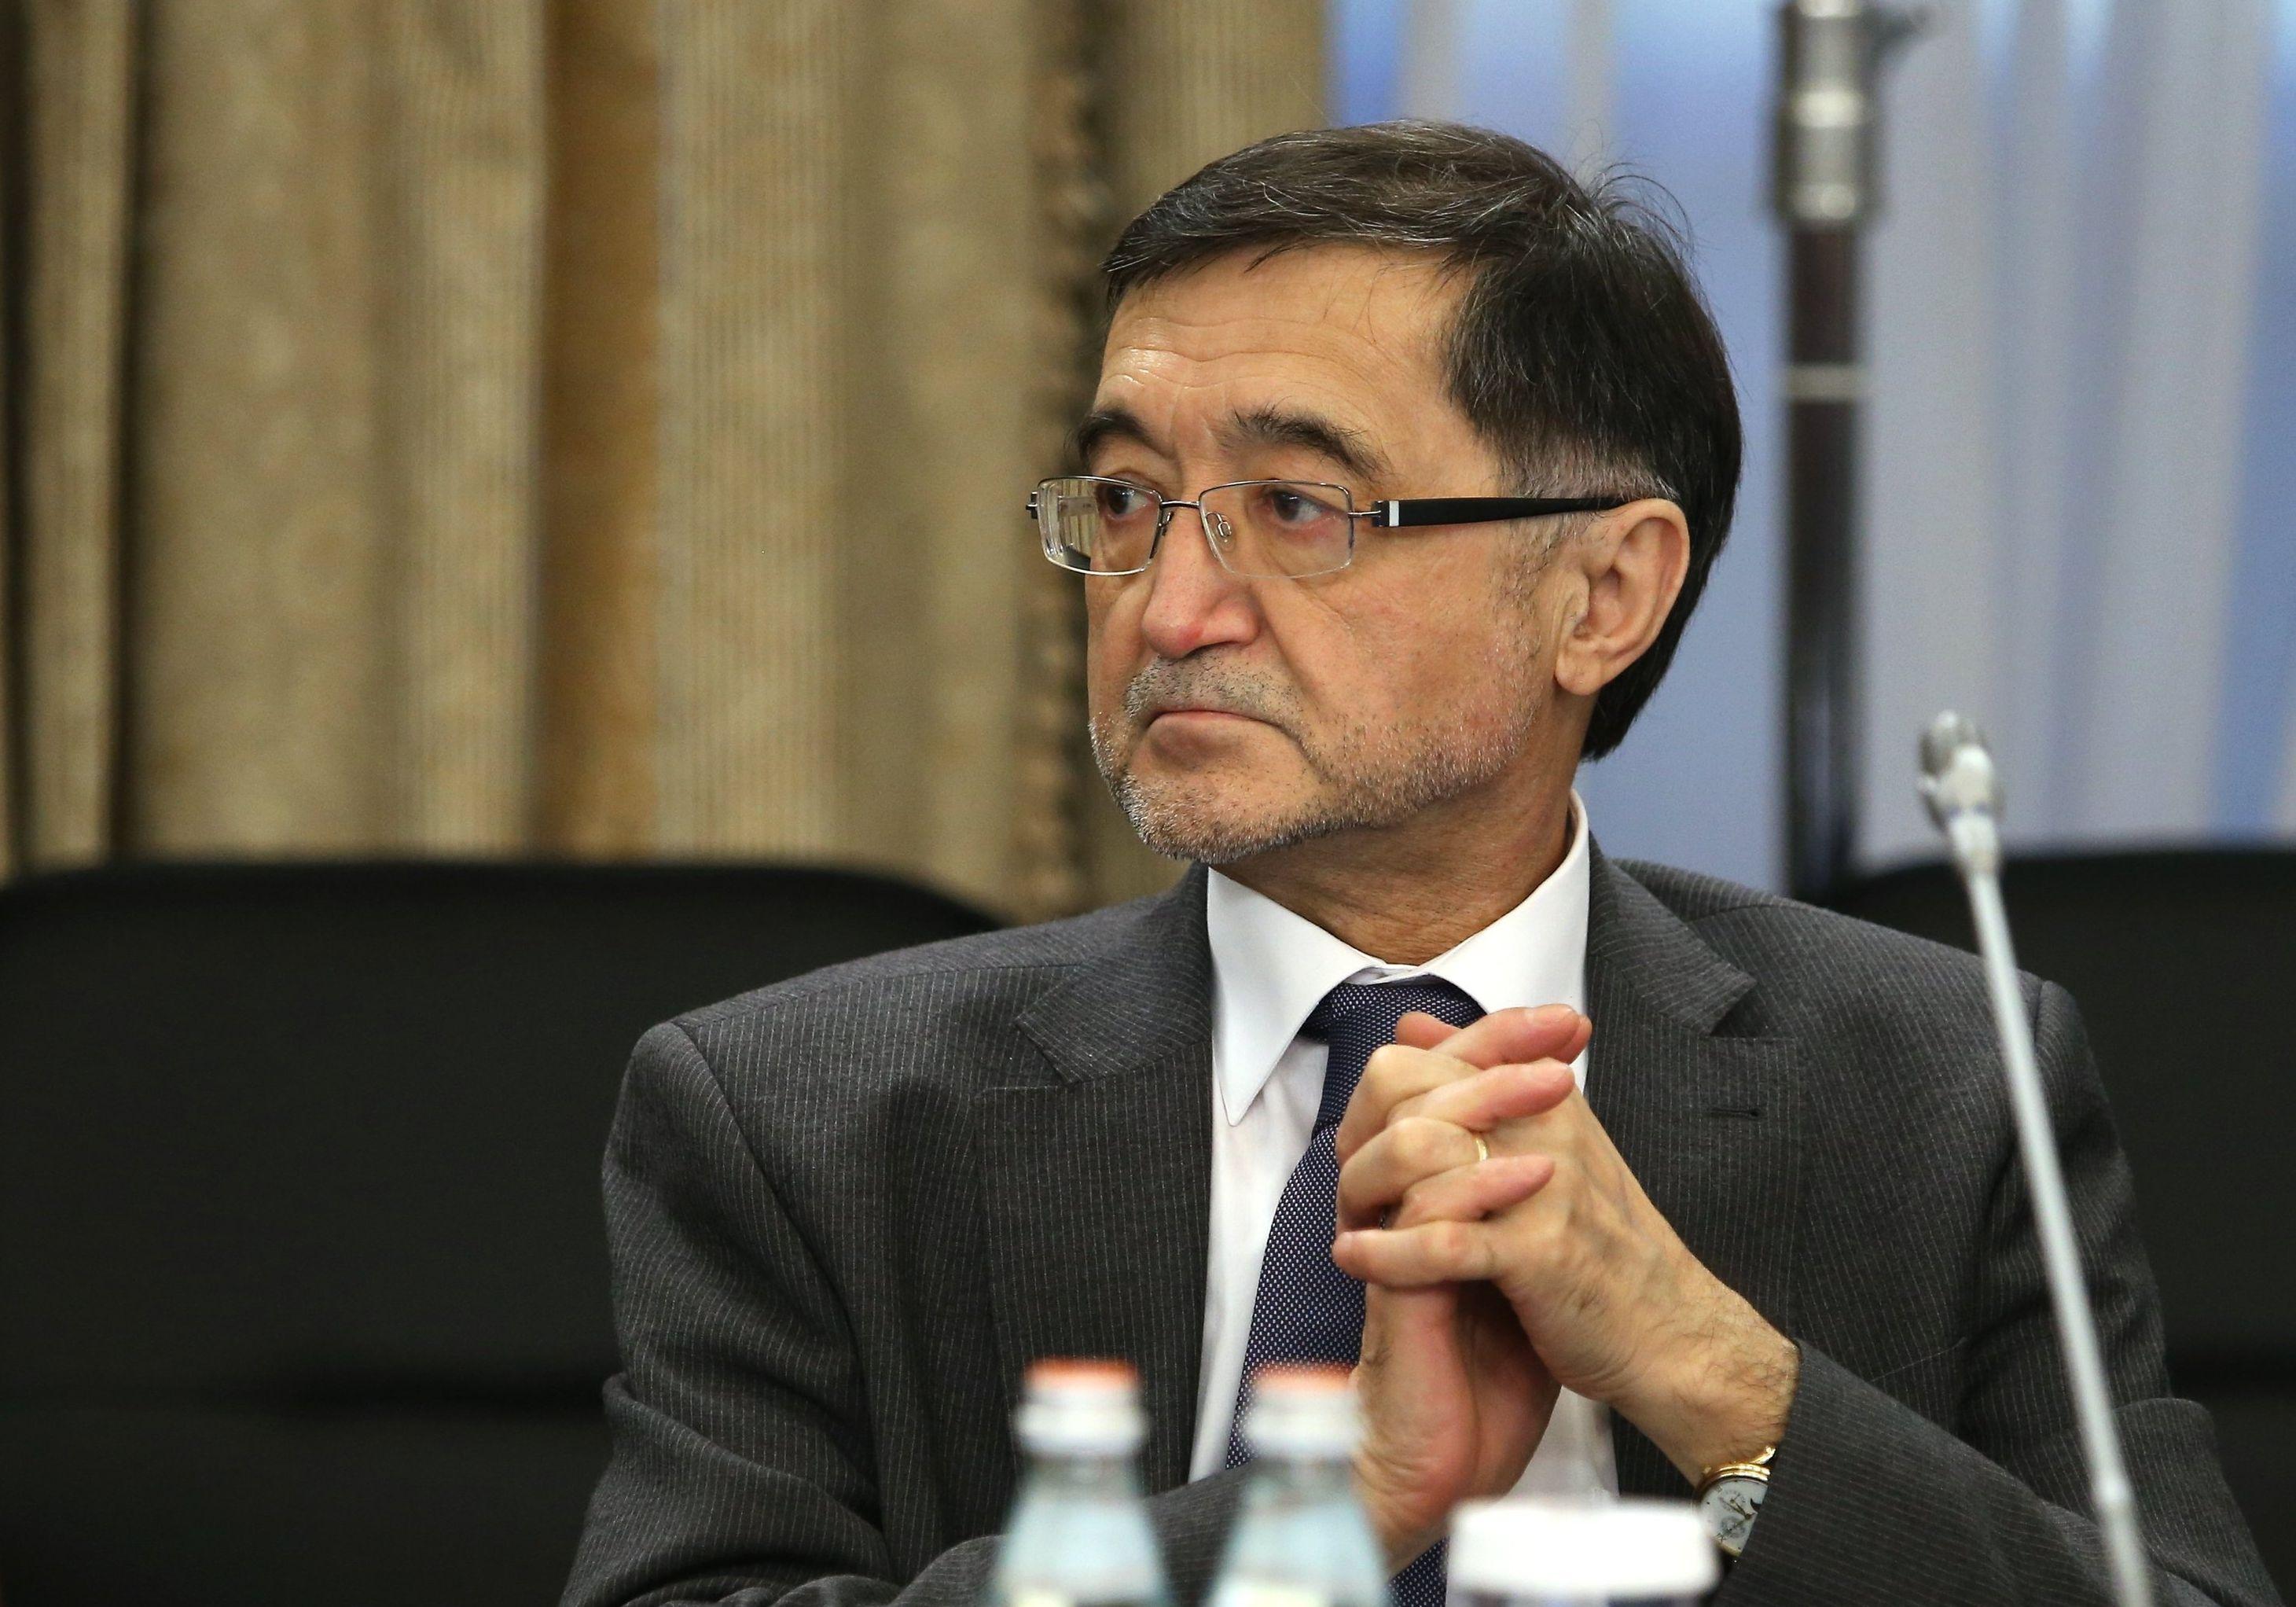 Спецпредставитель президента РФ в ШОС Бахтиер Хакимов